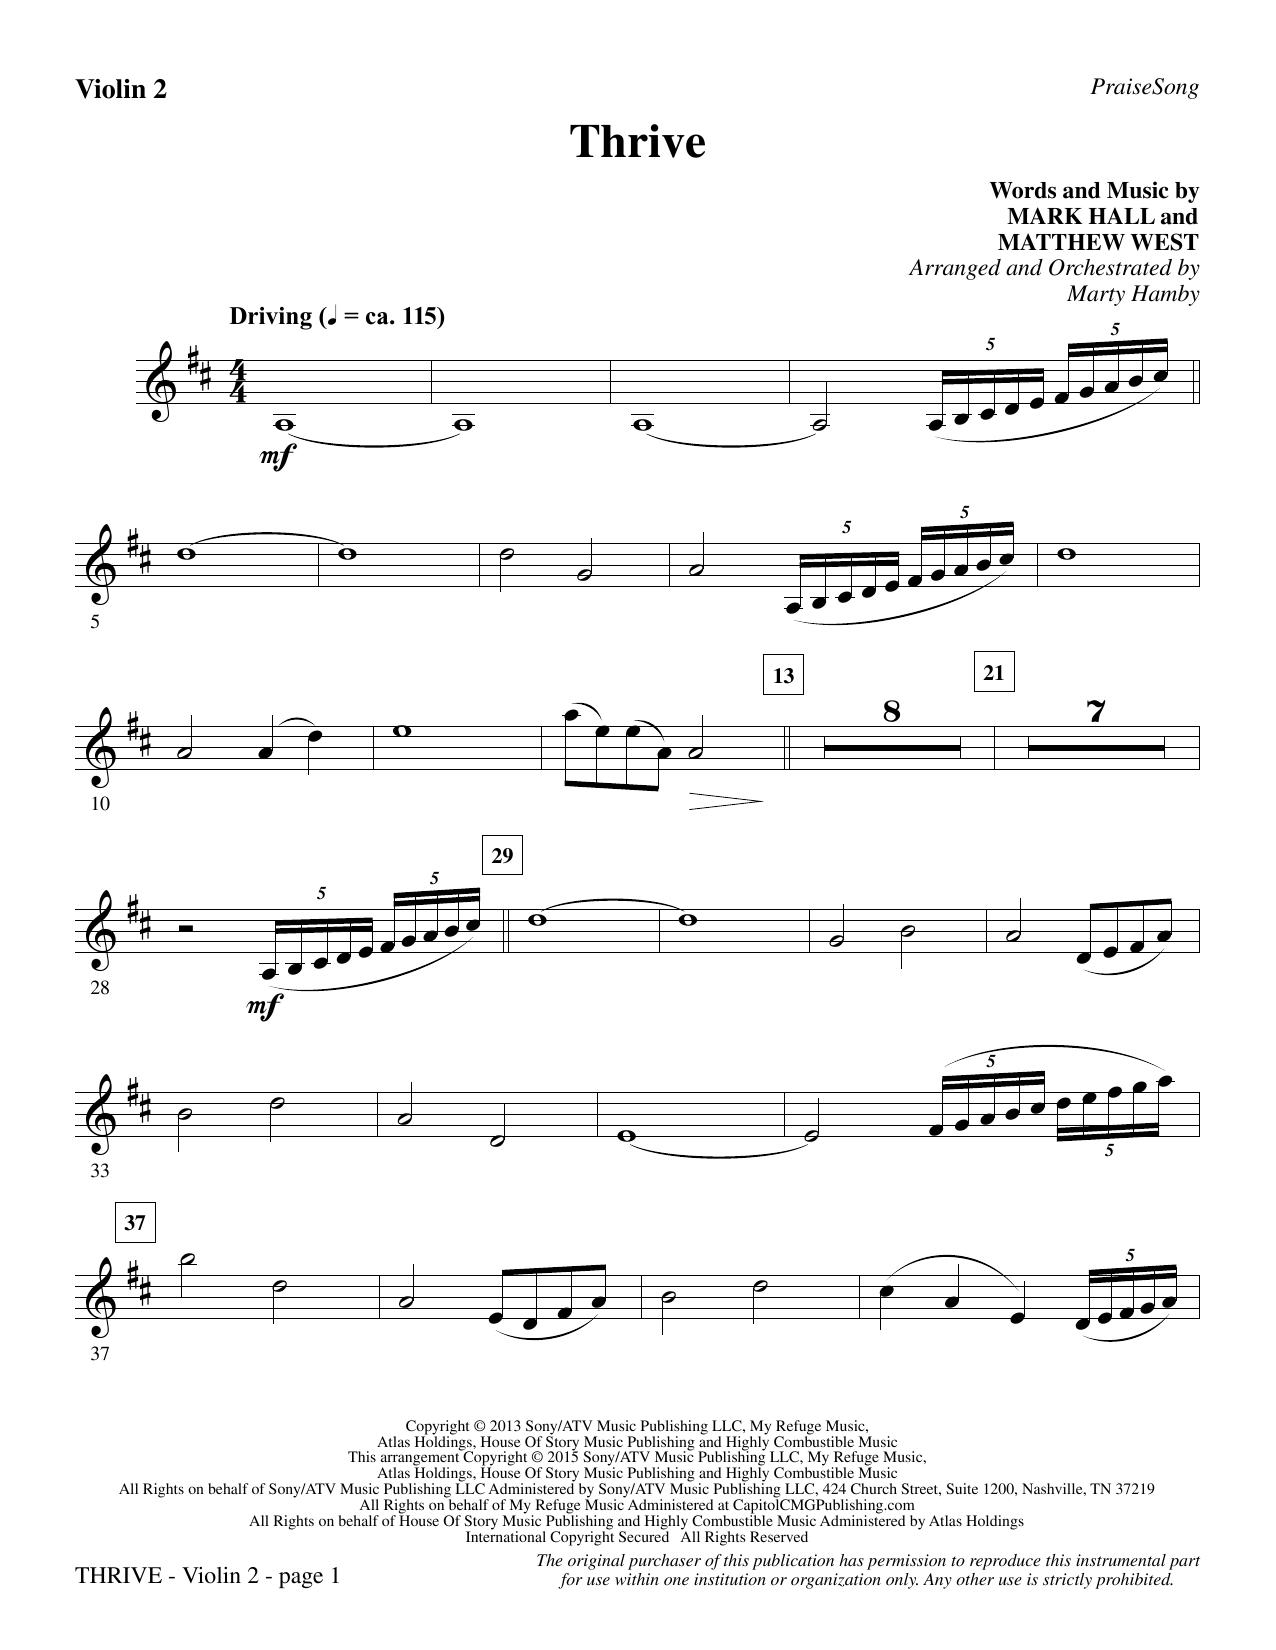 Thrive - Violin 2 sheet music